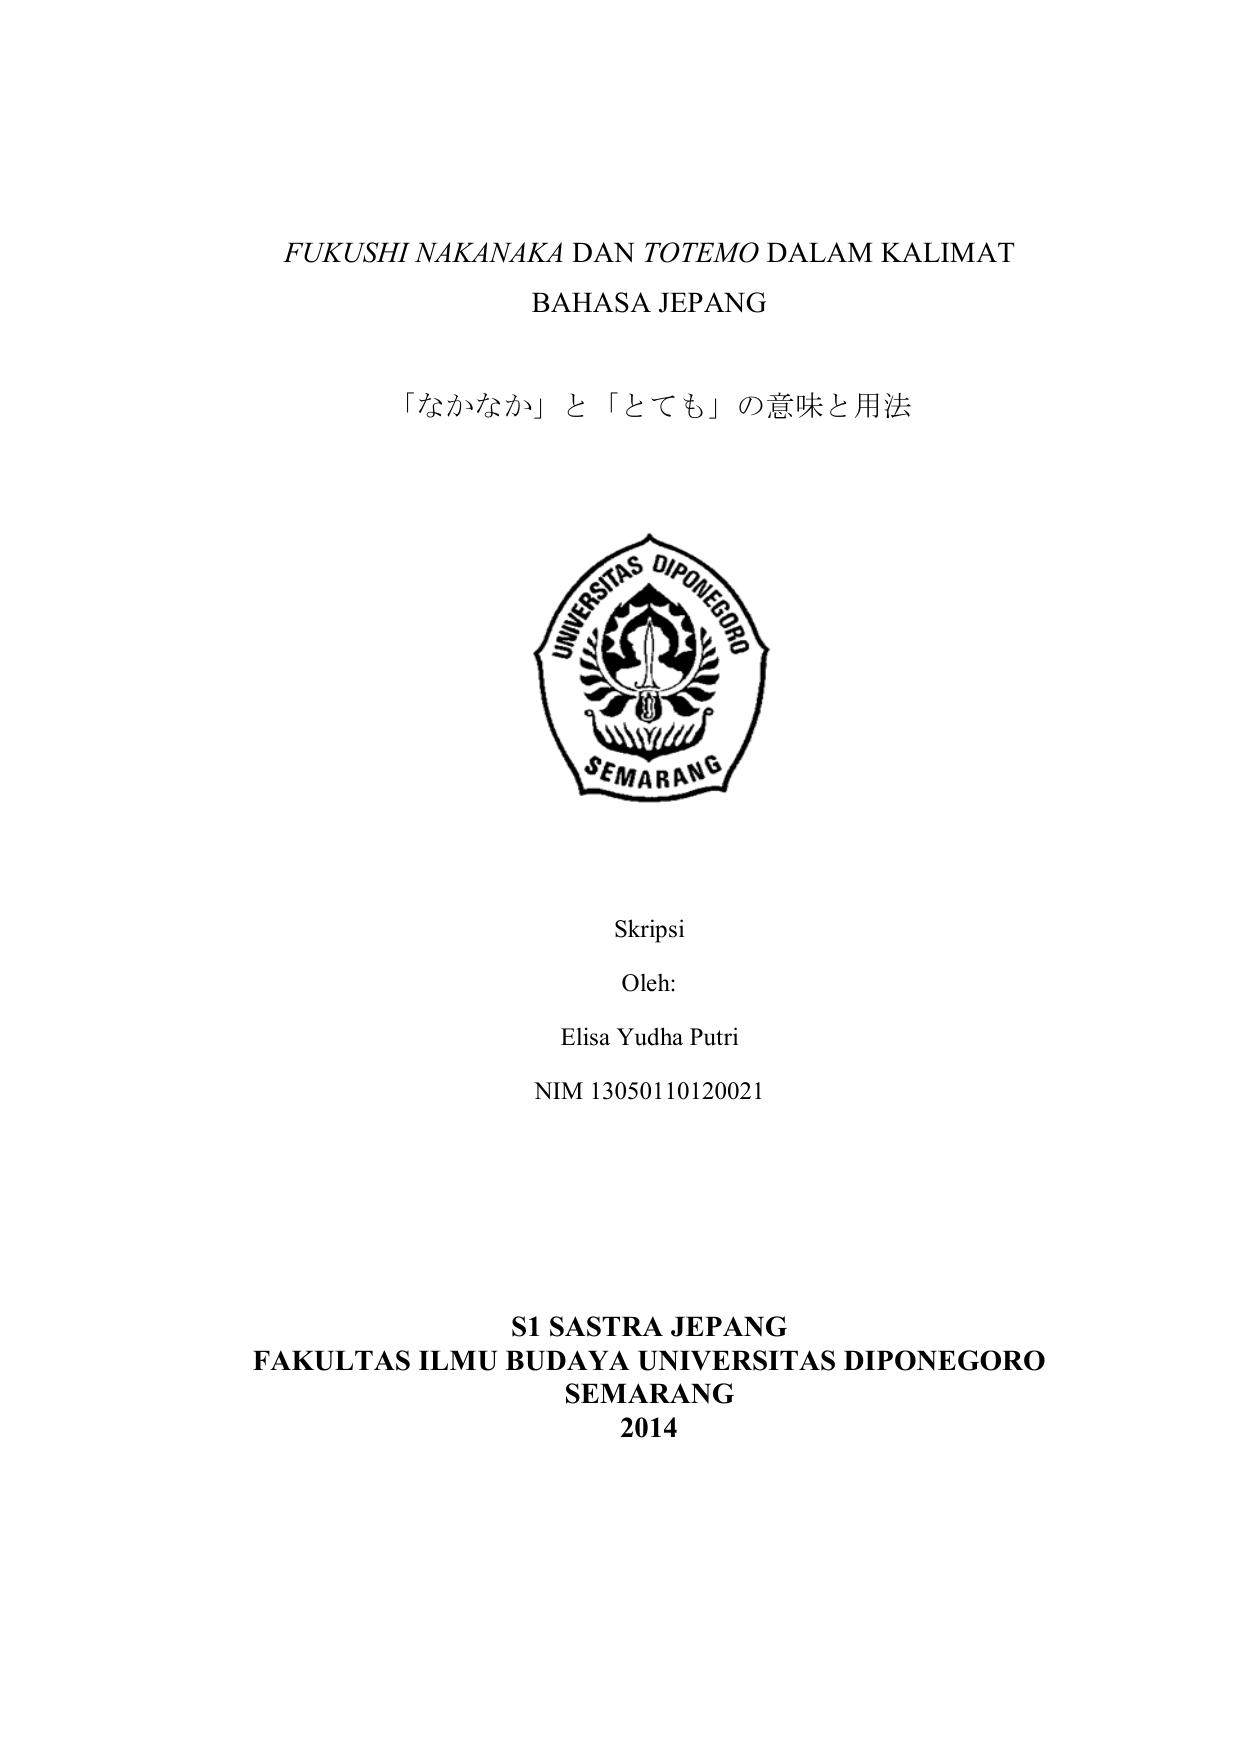 Fukushi Nakanaka Dan Totemo Dalam Kalimat Bahasa